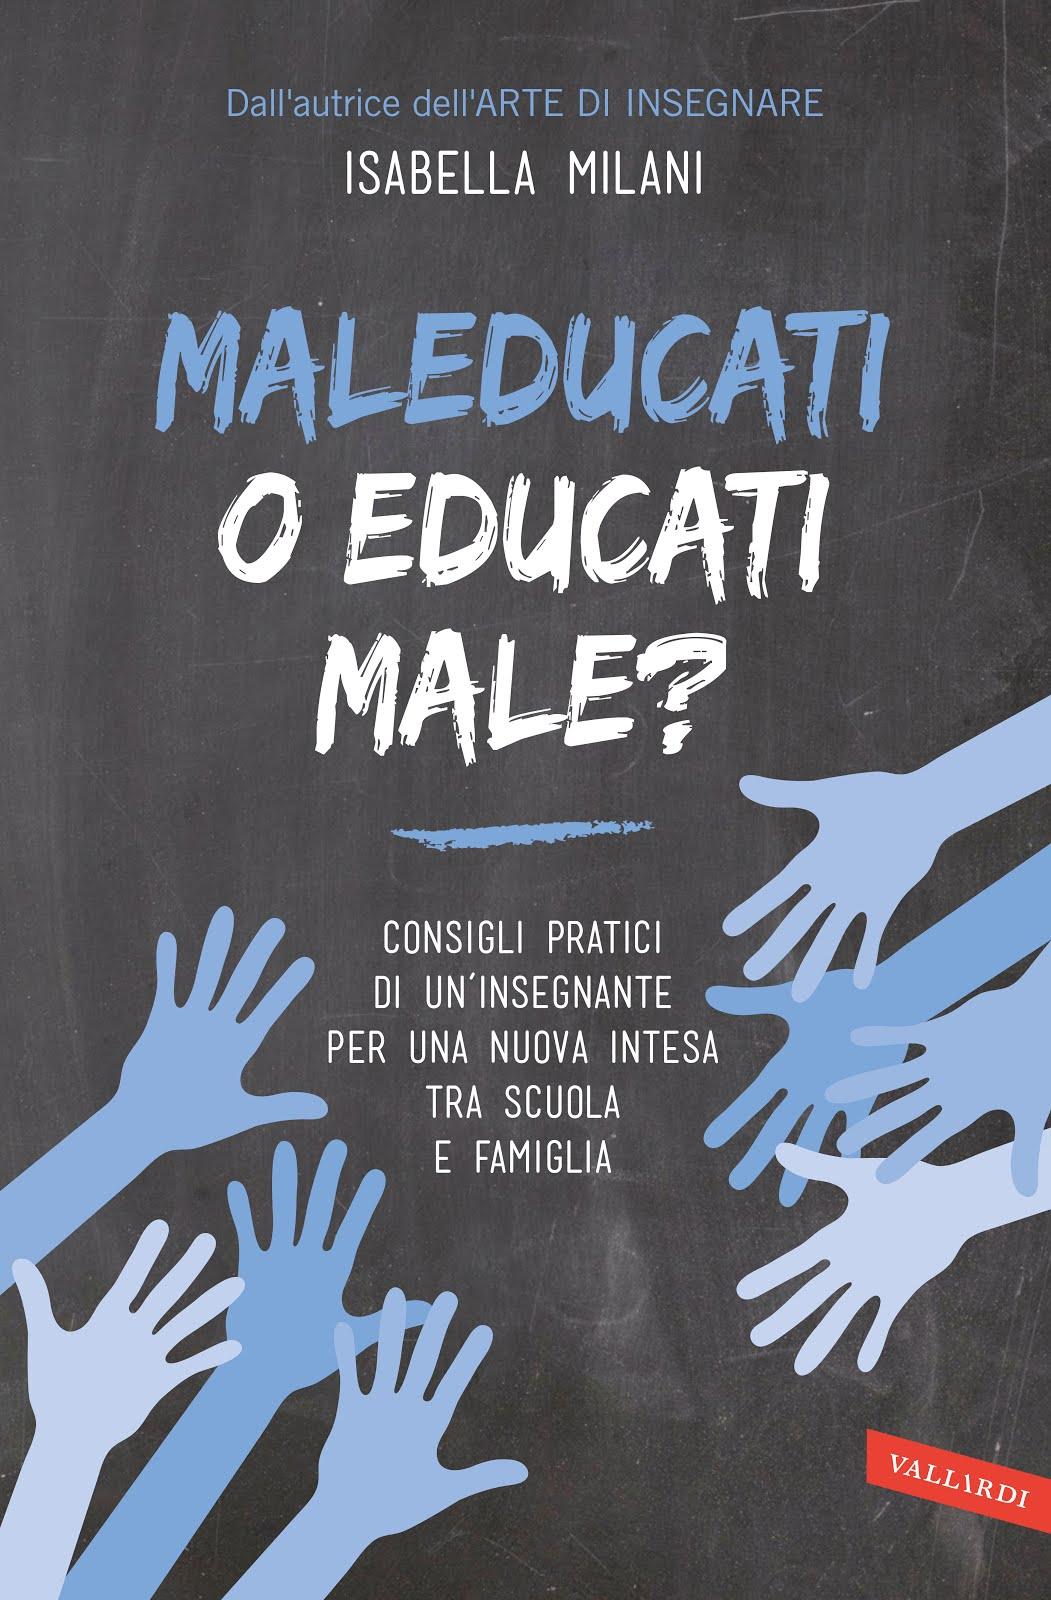 MALEDUCATI o EDUCATI MALE? su LaFeltrinelli